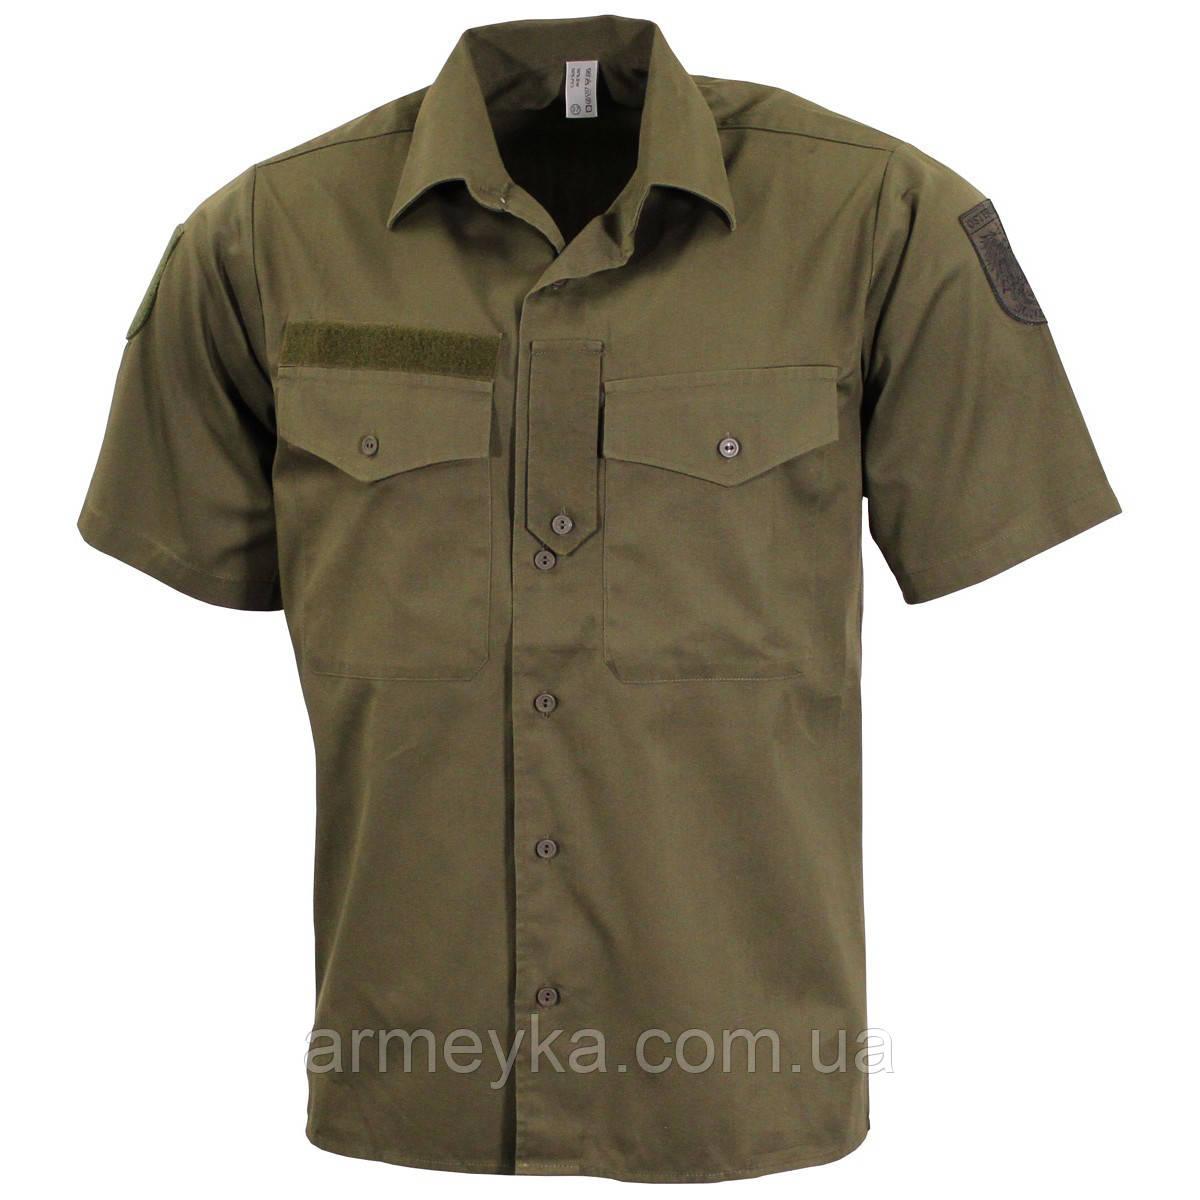 23fd9aa9b724d Полевая рубашка (сорочка), короткий рукав. ВС Австрии, оригинал ...